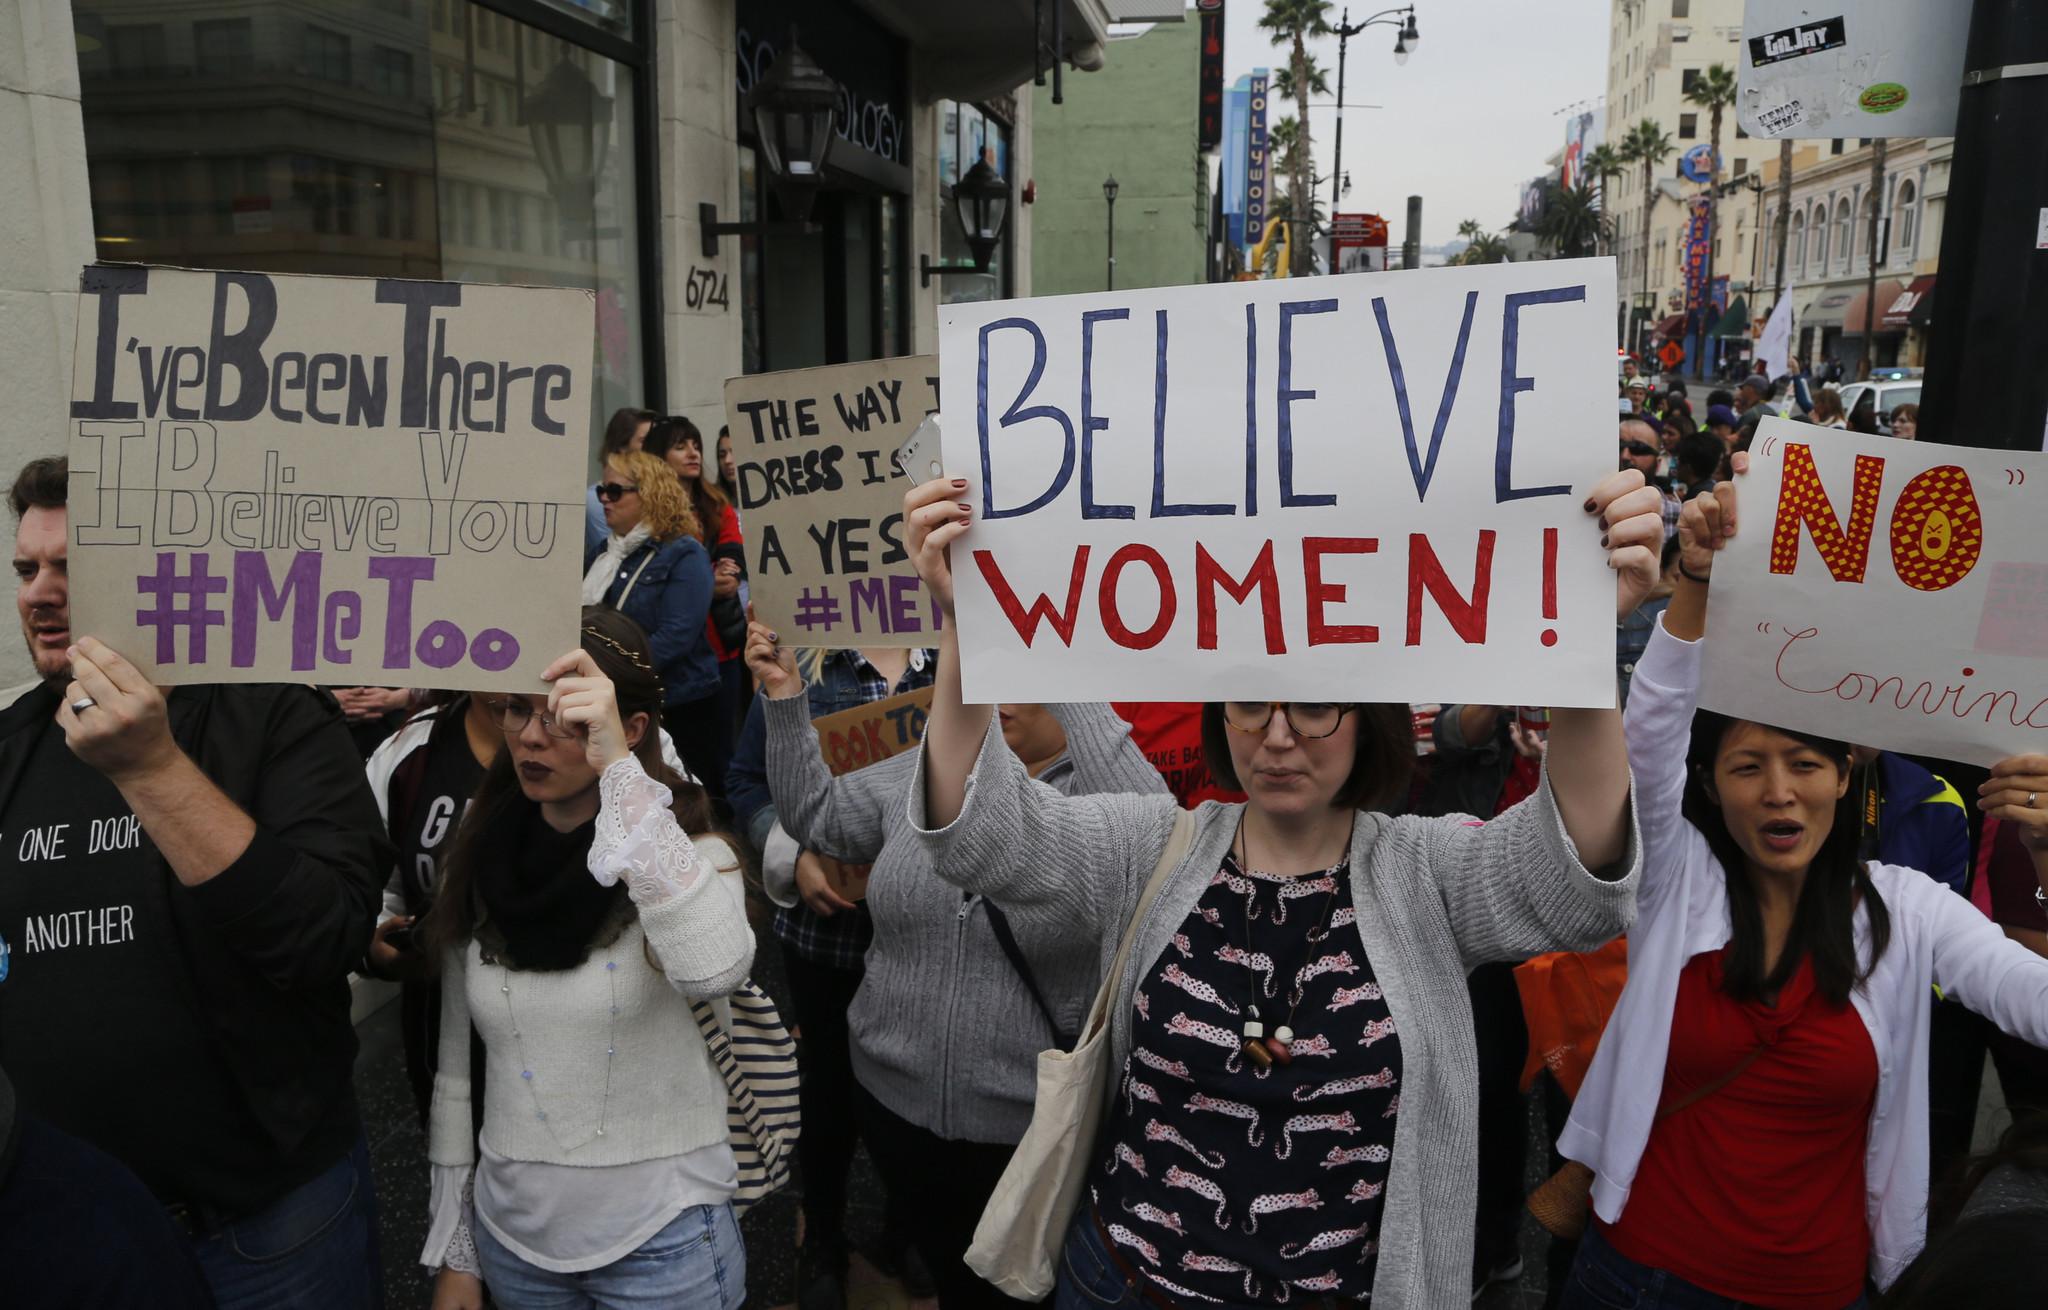 Cbp harassment vs sexual harassment